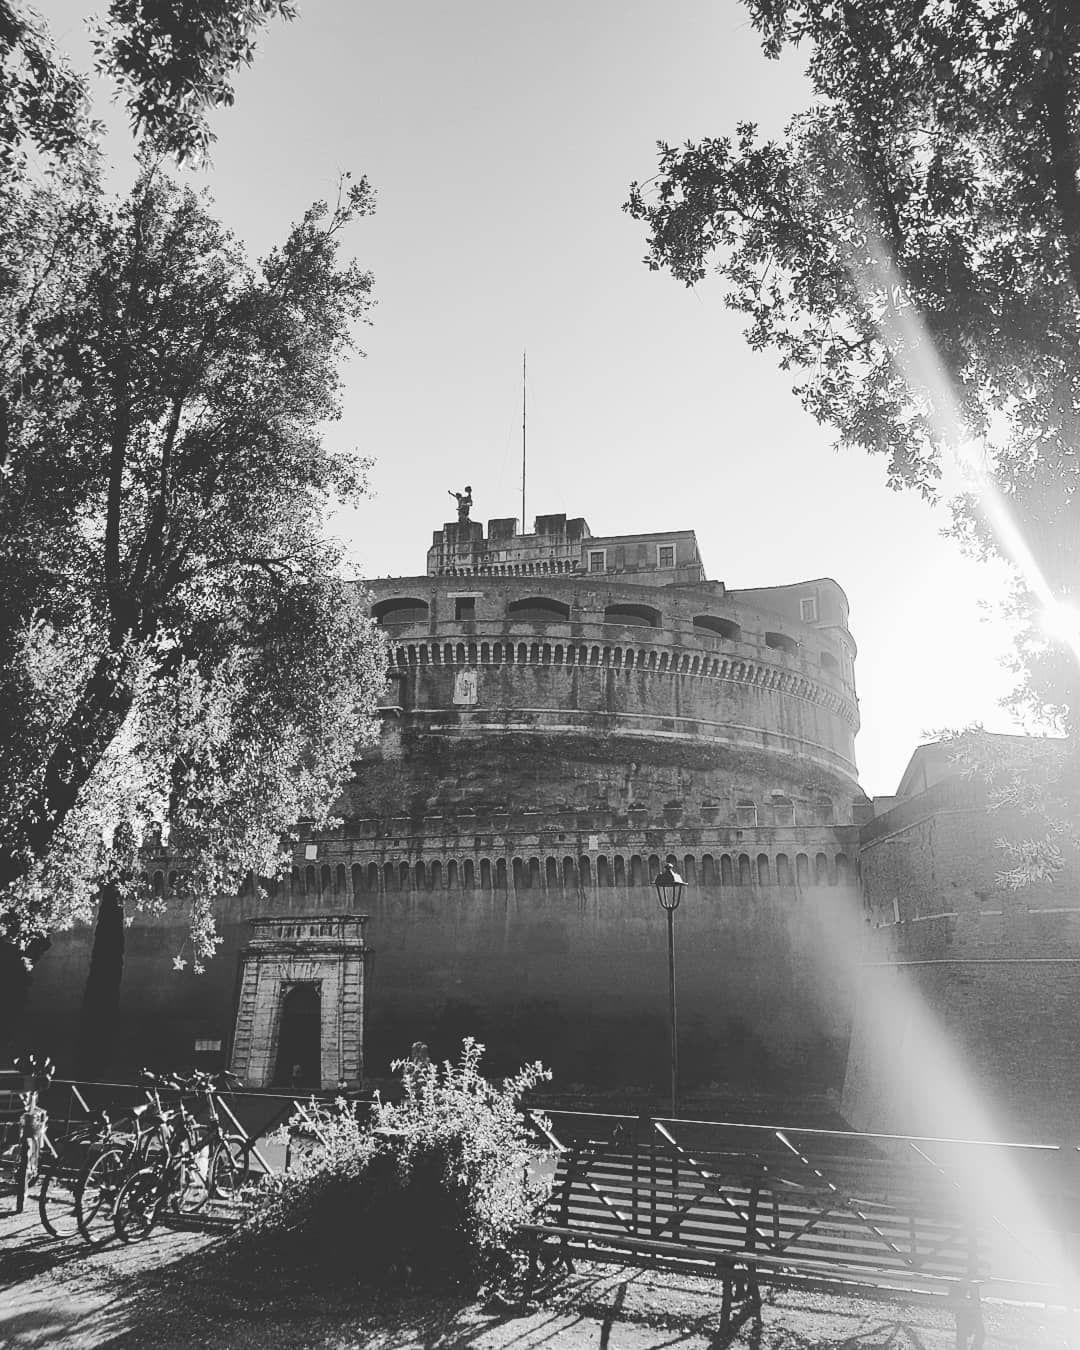 Castel Sant Angelo Ii Xvi Century Roma Roma Rome Castelsantangelo Empire Mausoleum Emperor Adrianus R Castel Sant Angelo Roman Empire Mausoleum